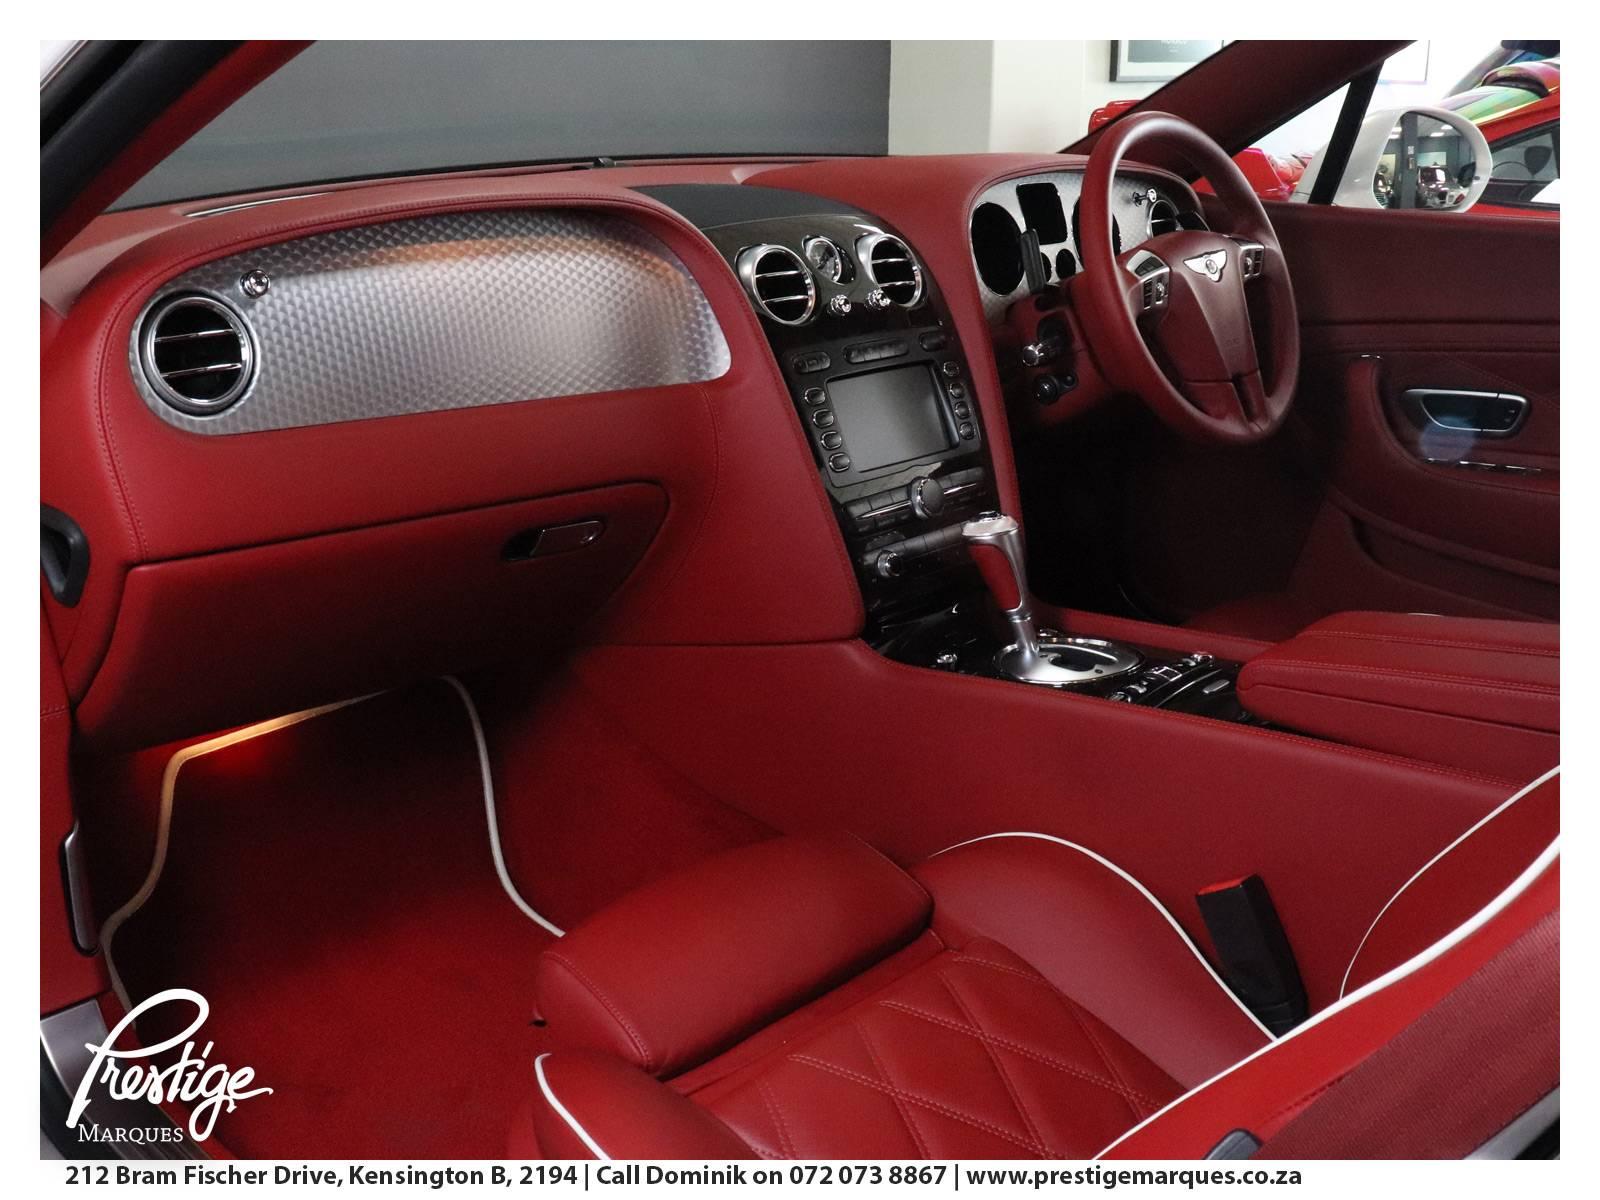 2011-Bentley-continental-Prestige-Marques-Randburg-Sandton-11